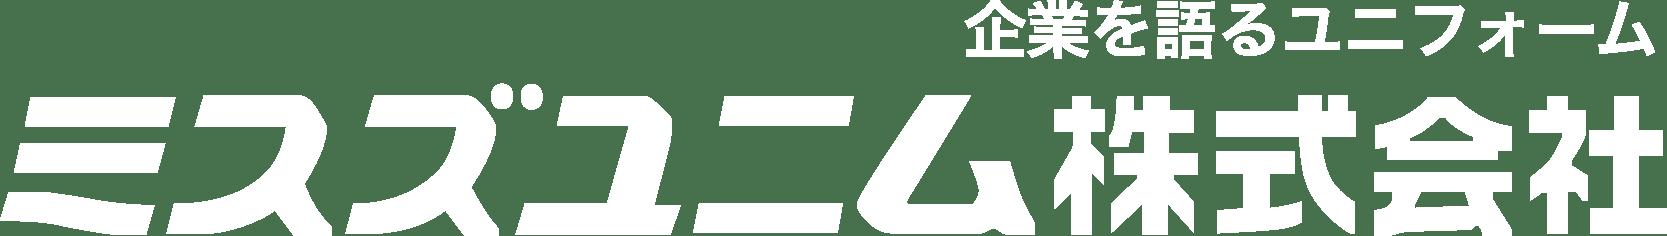 misuzu-logo-jp-72